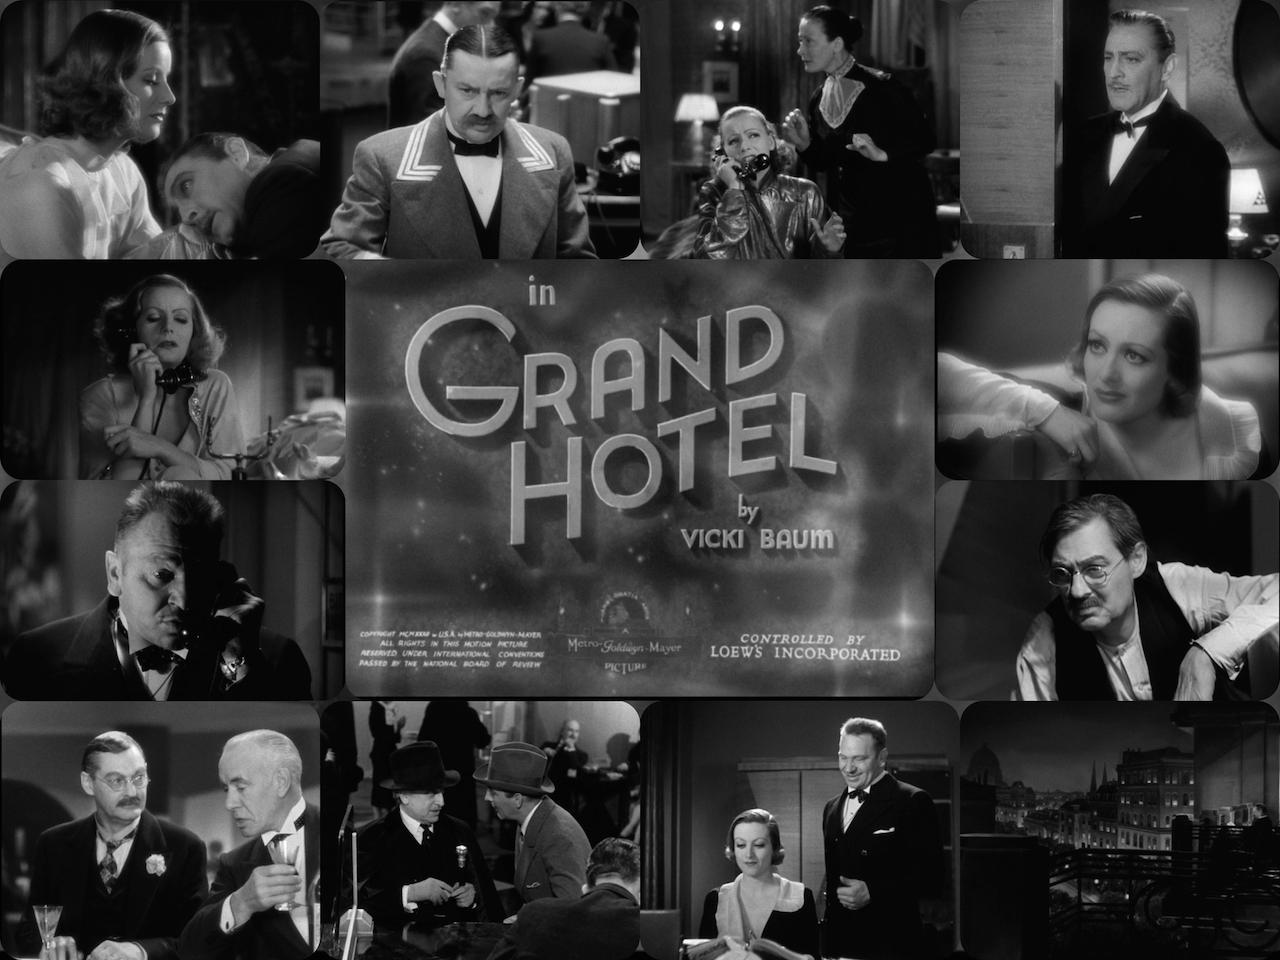 film review grand hotel 1932 cinema omnivore. Black Bedroom Furniture Sets. Home Design Ideas